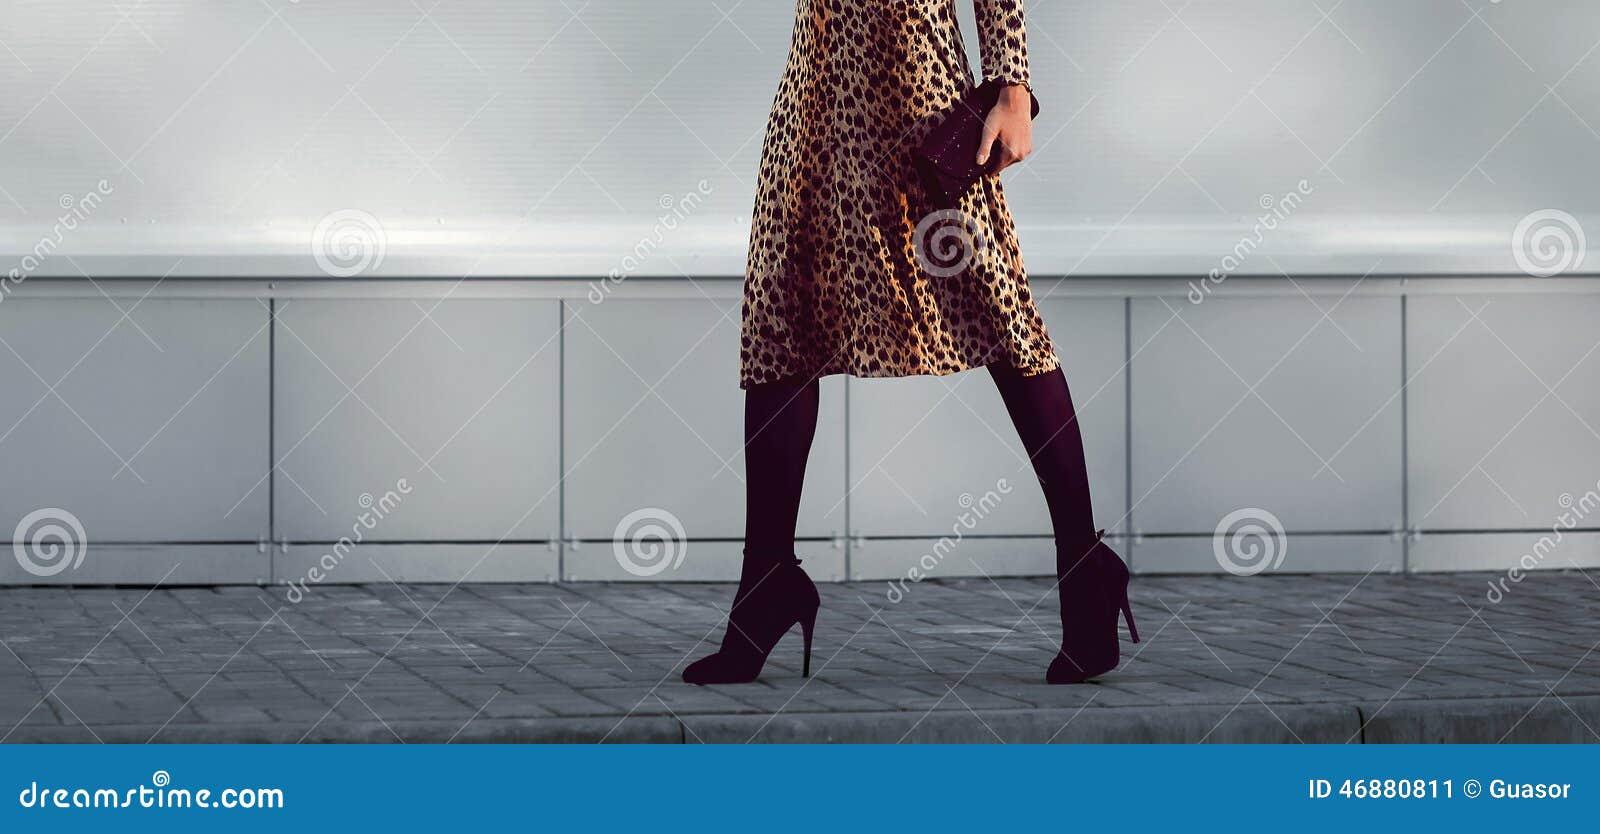 Street fashion concept - stylish elegant woman in leopard dress